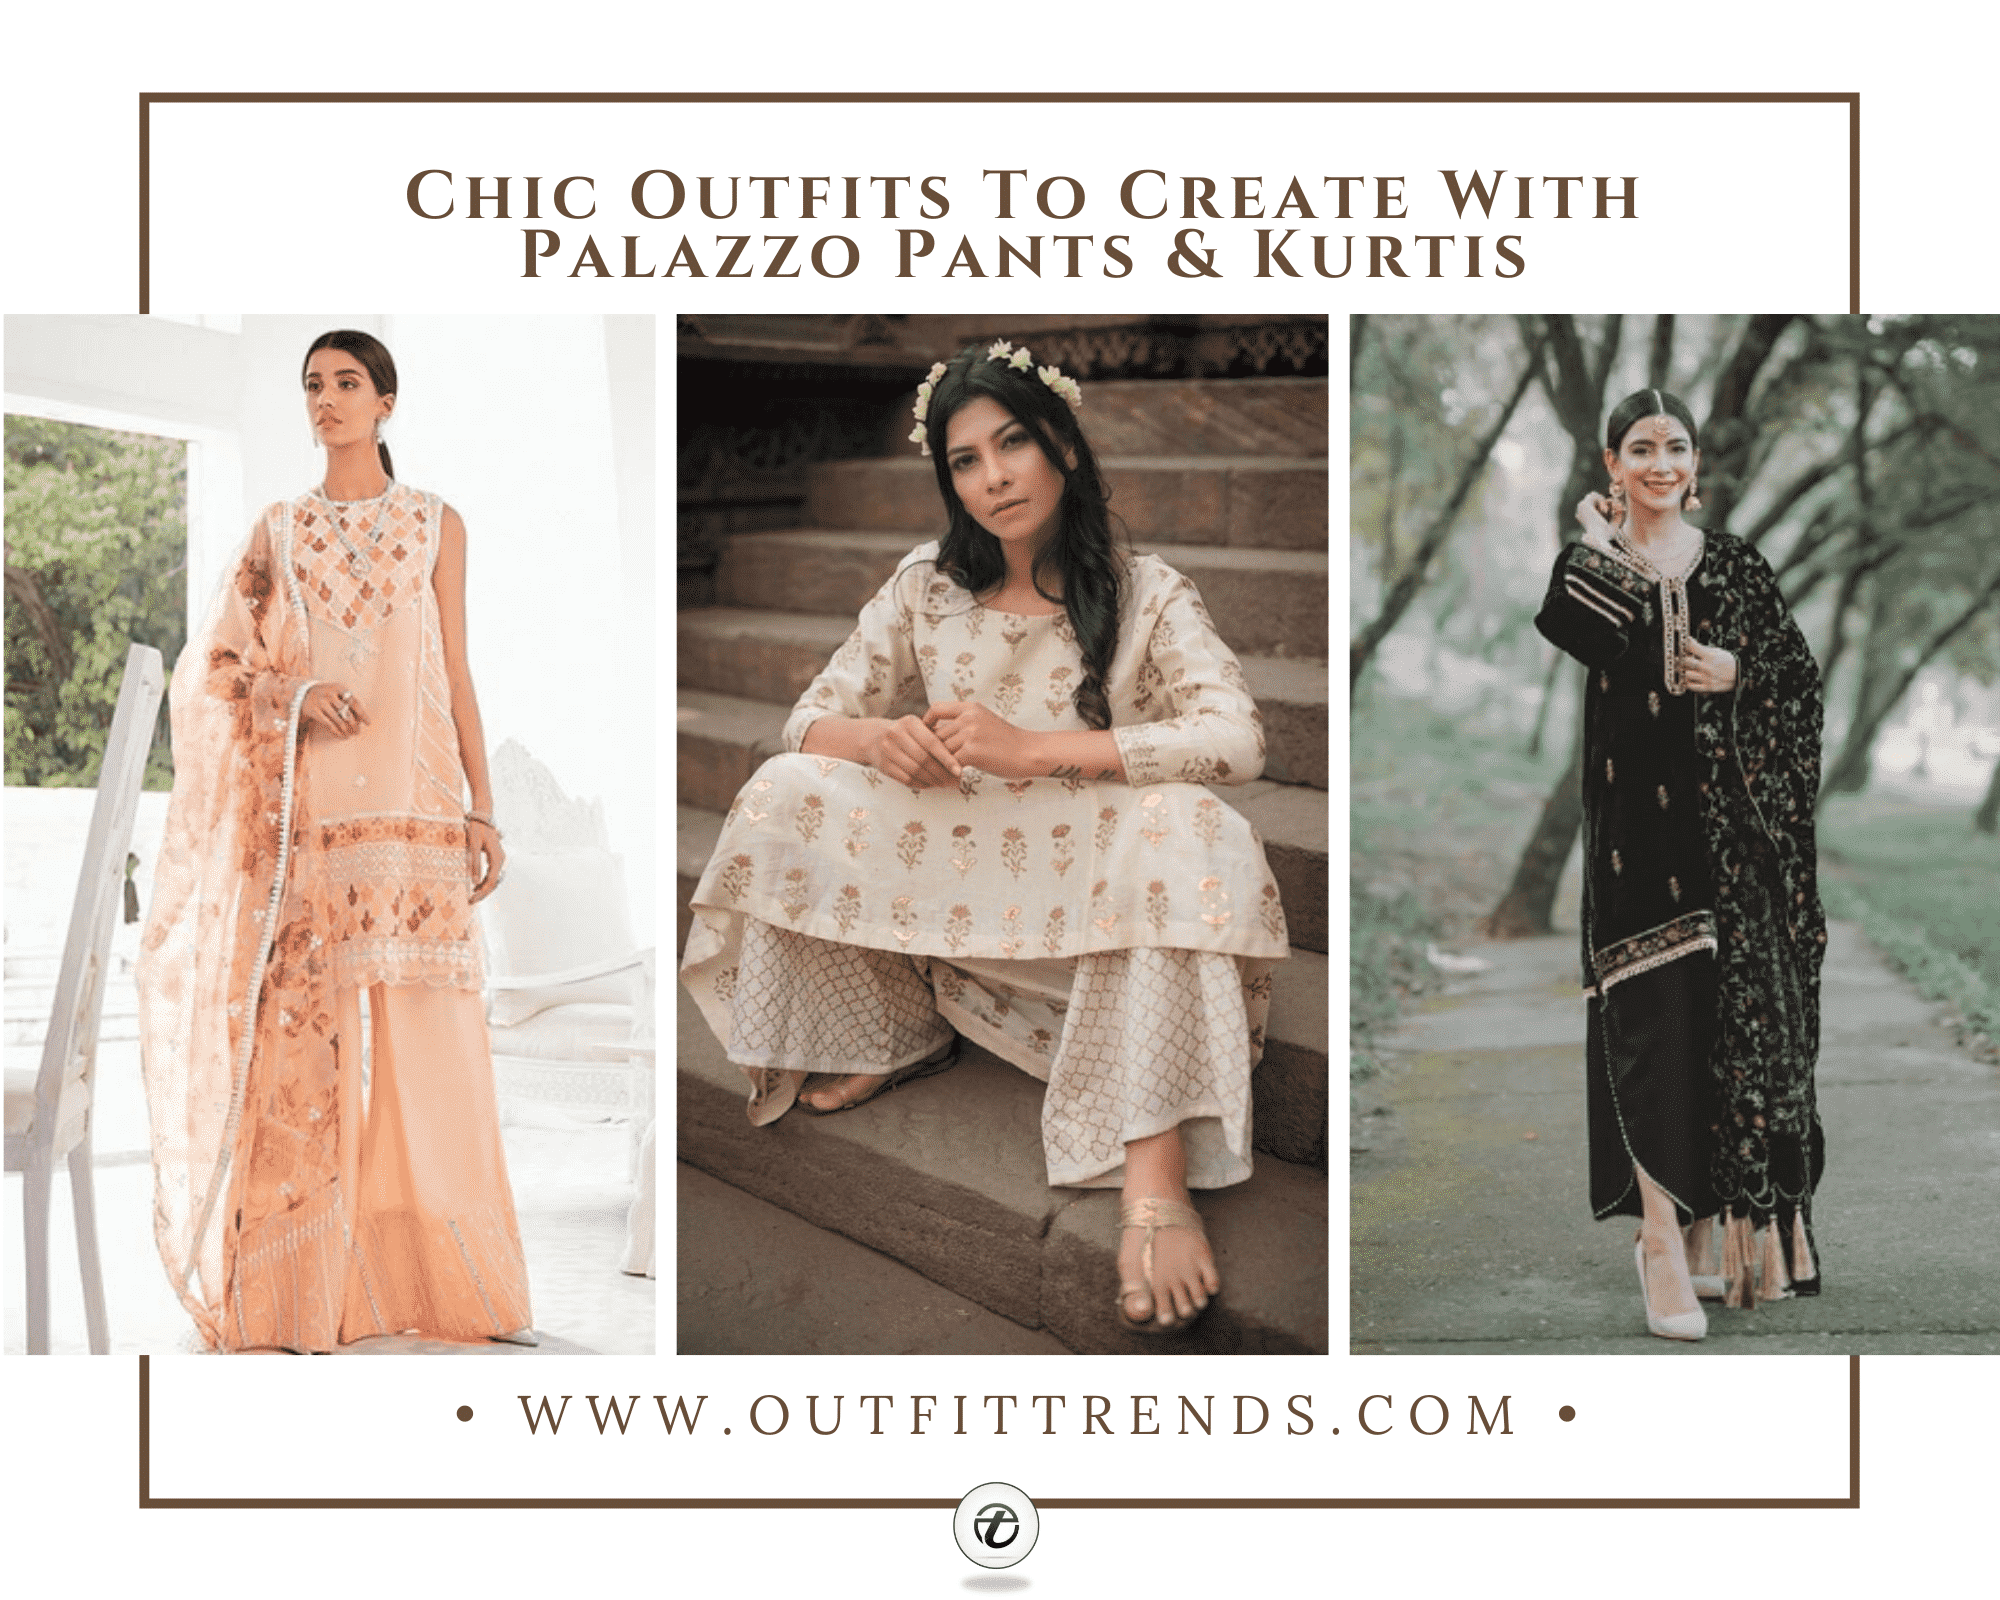 Kurtis With Palazzo Pants 27 Ways to Wear Palazzo Kurtis